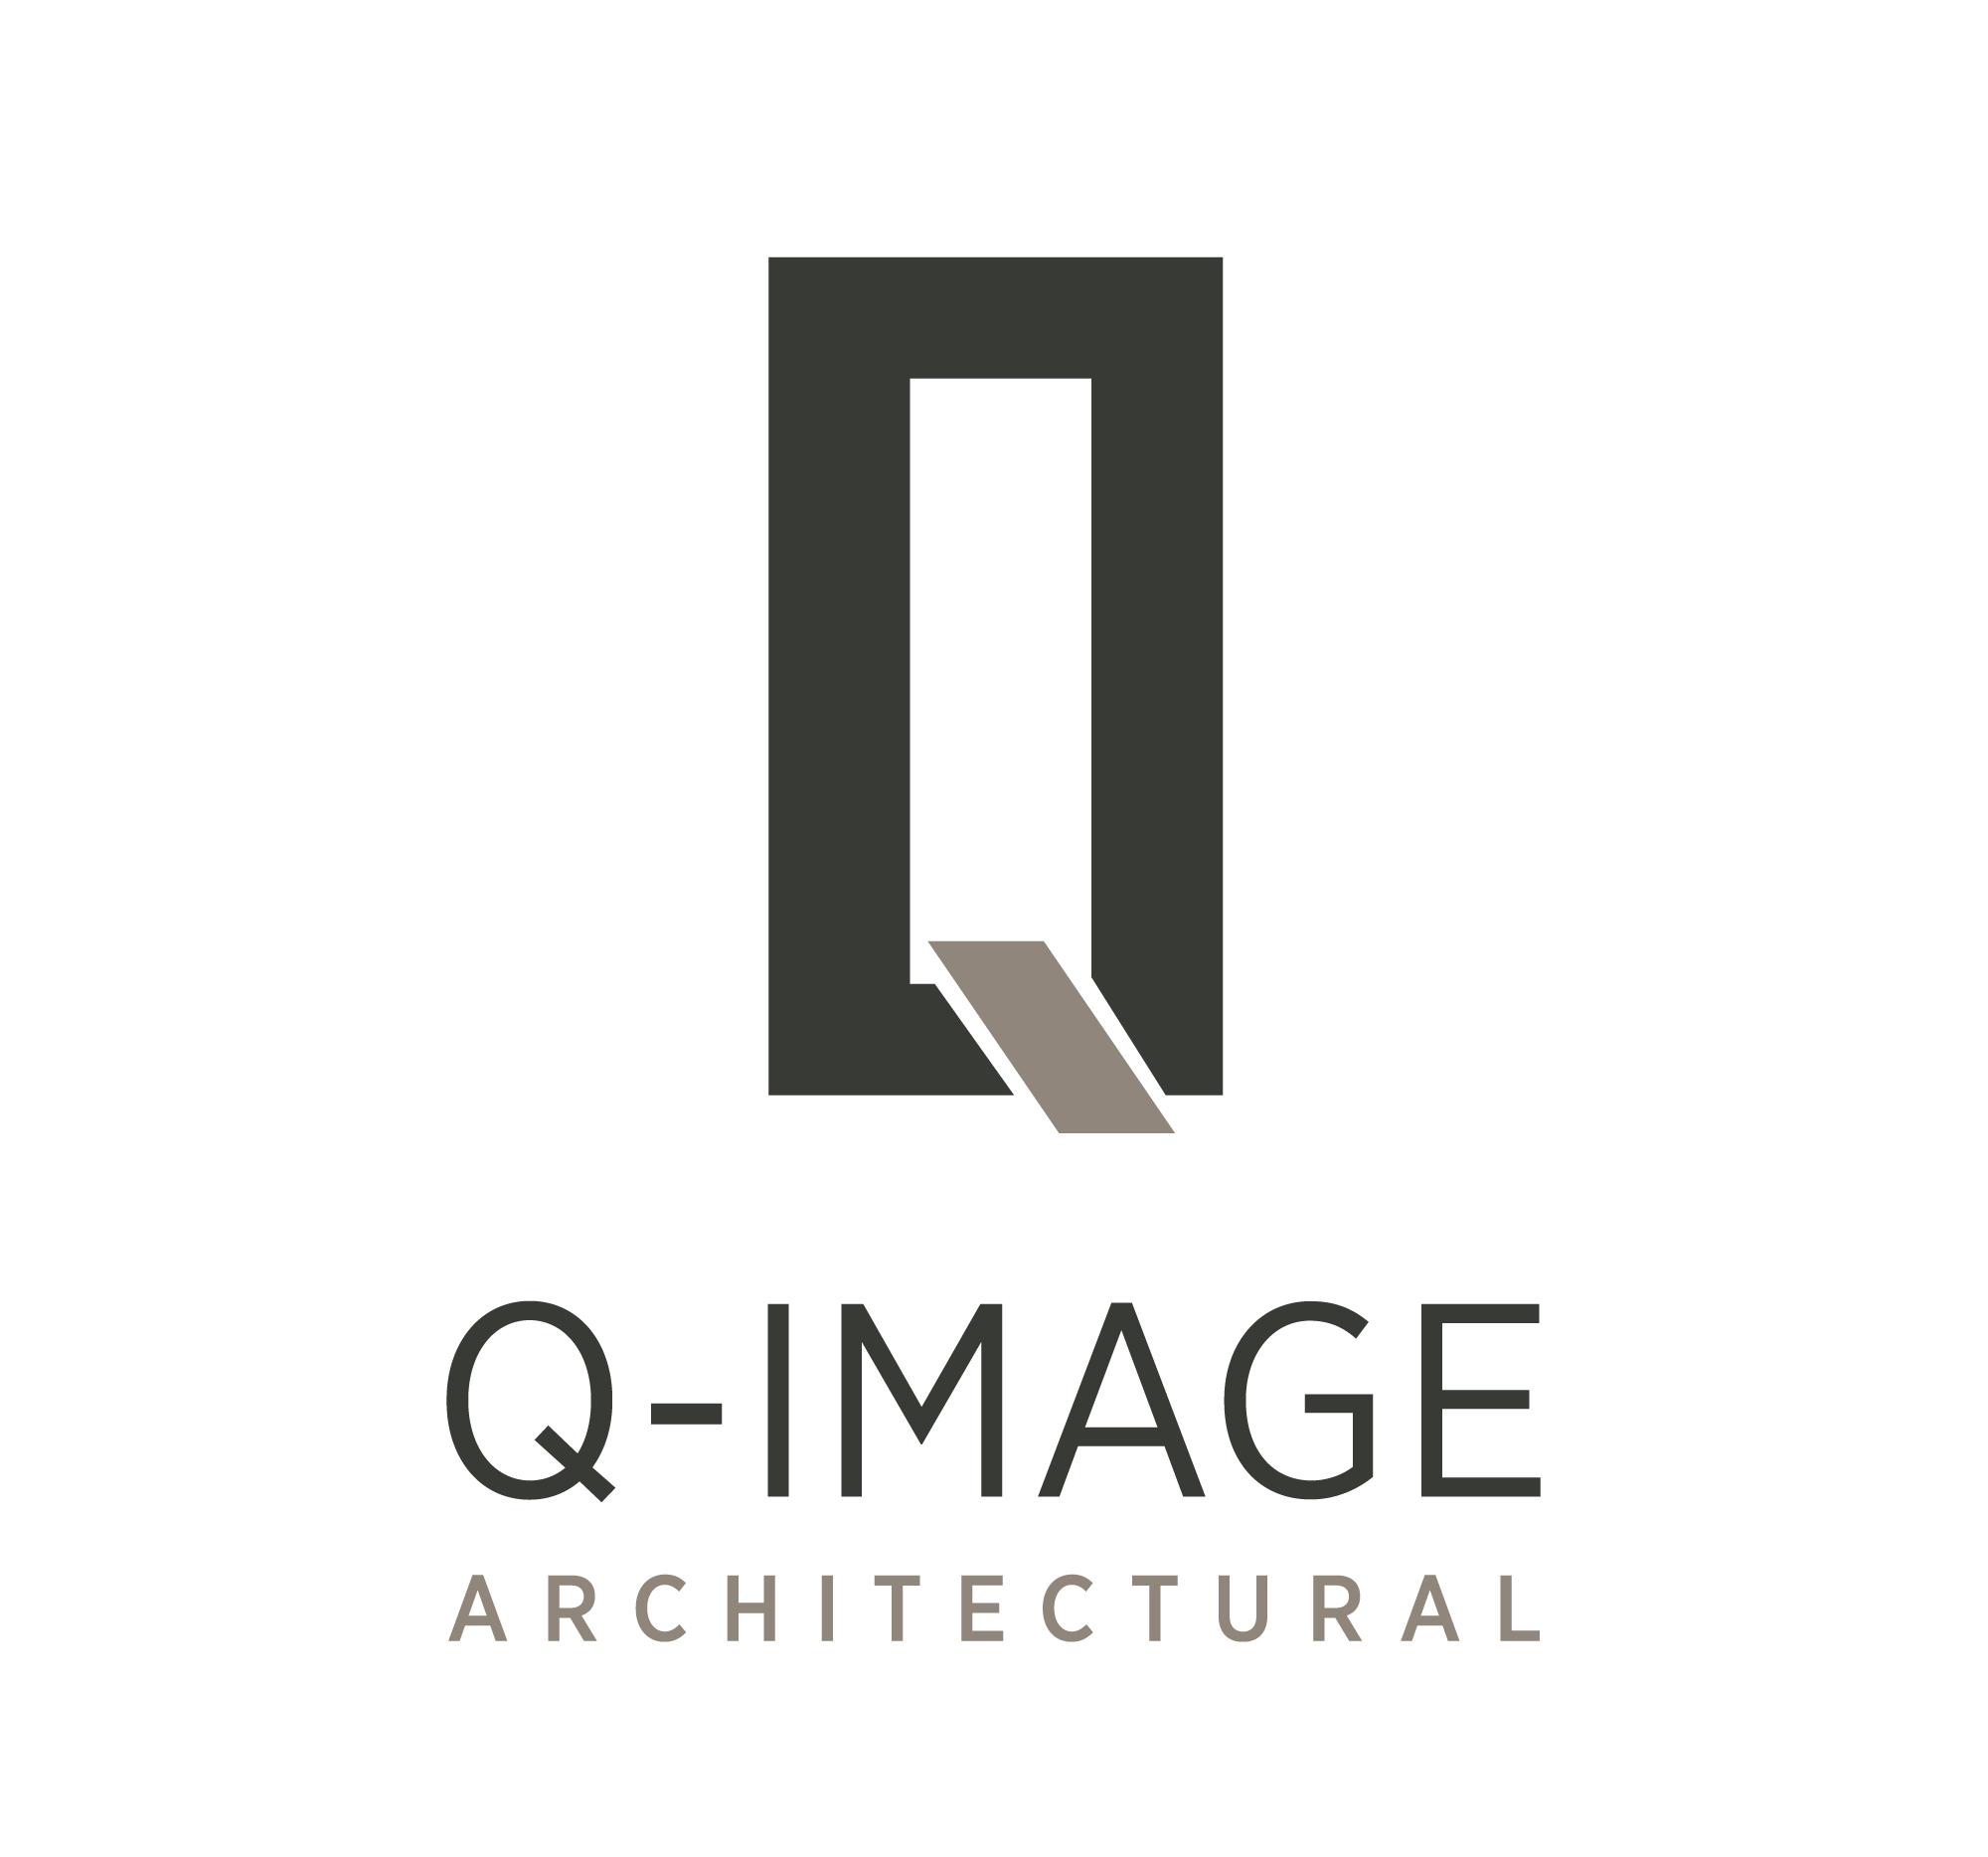 Qi Logo Architectural Originalx 5 18 Bennett Joshua